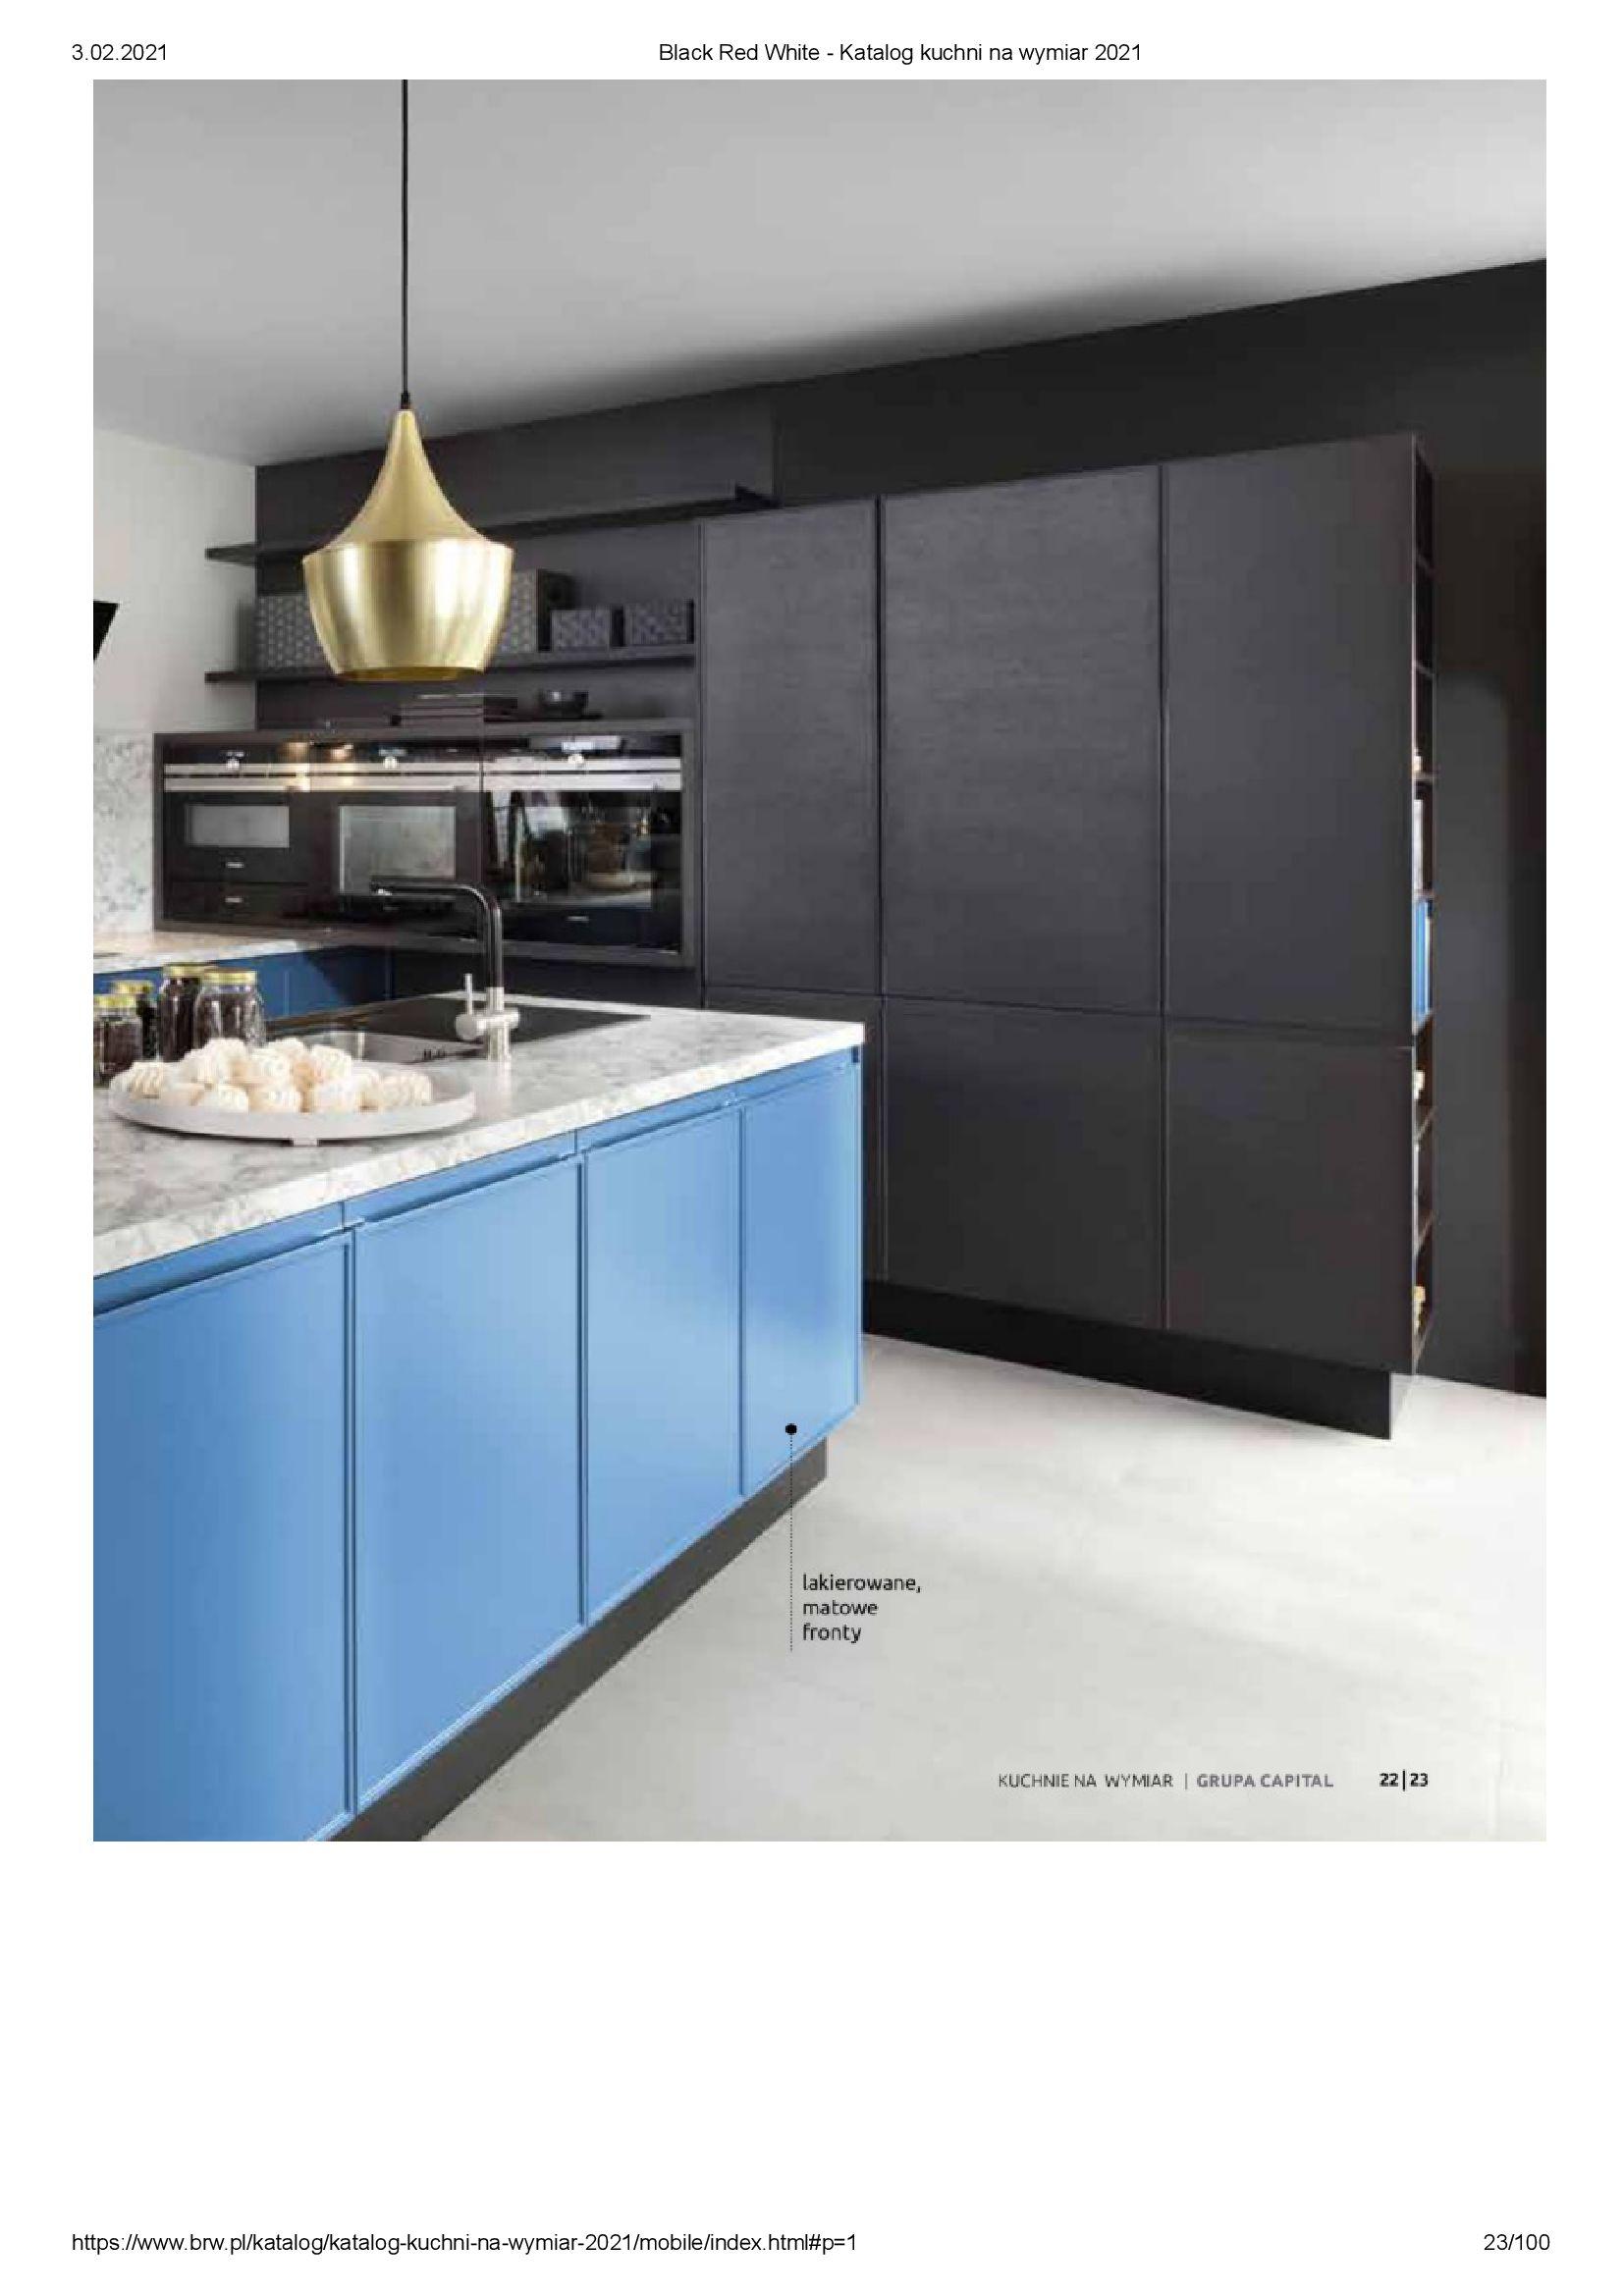 Gazetka Black Red White: Katalog - Kuchnie na wymiar Senso Kitchens 2021 2021-01-01 page-23